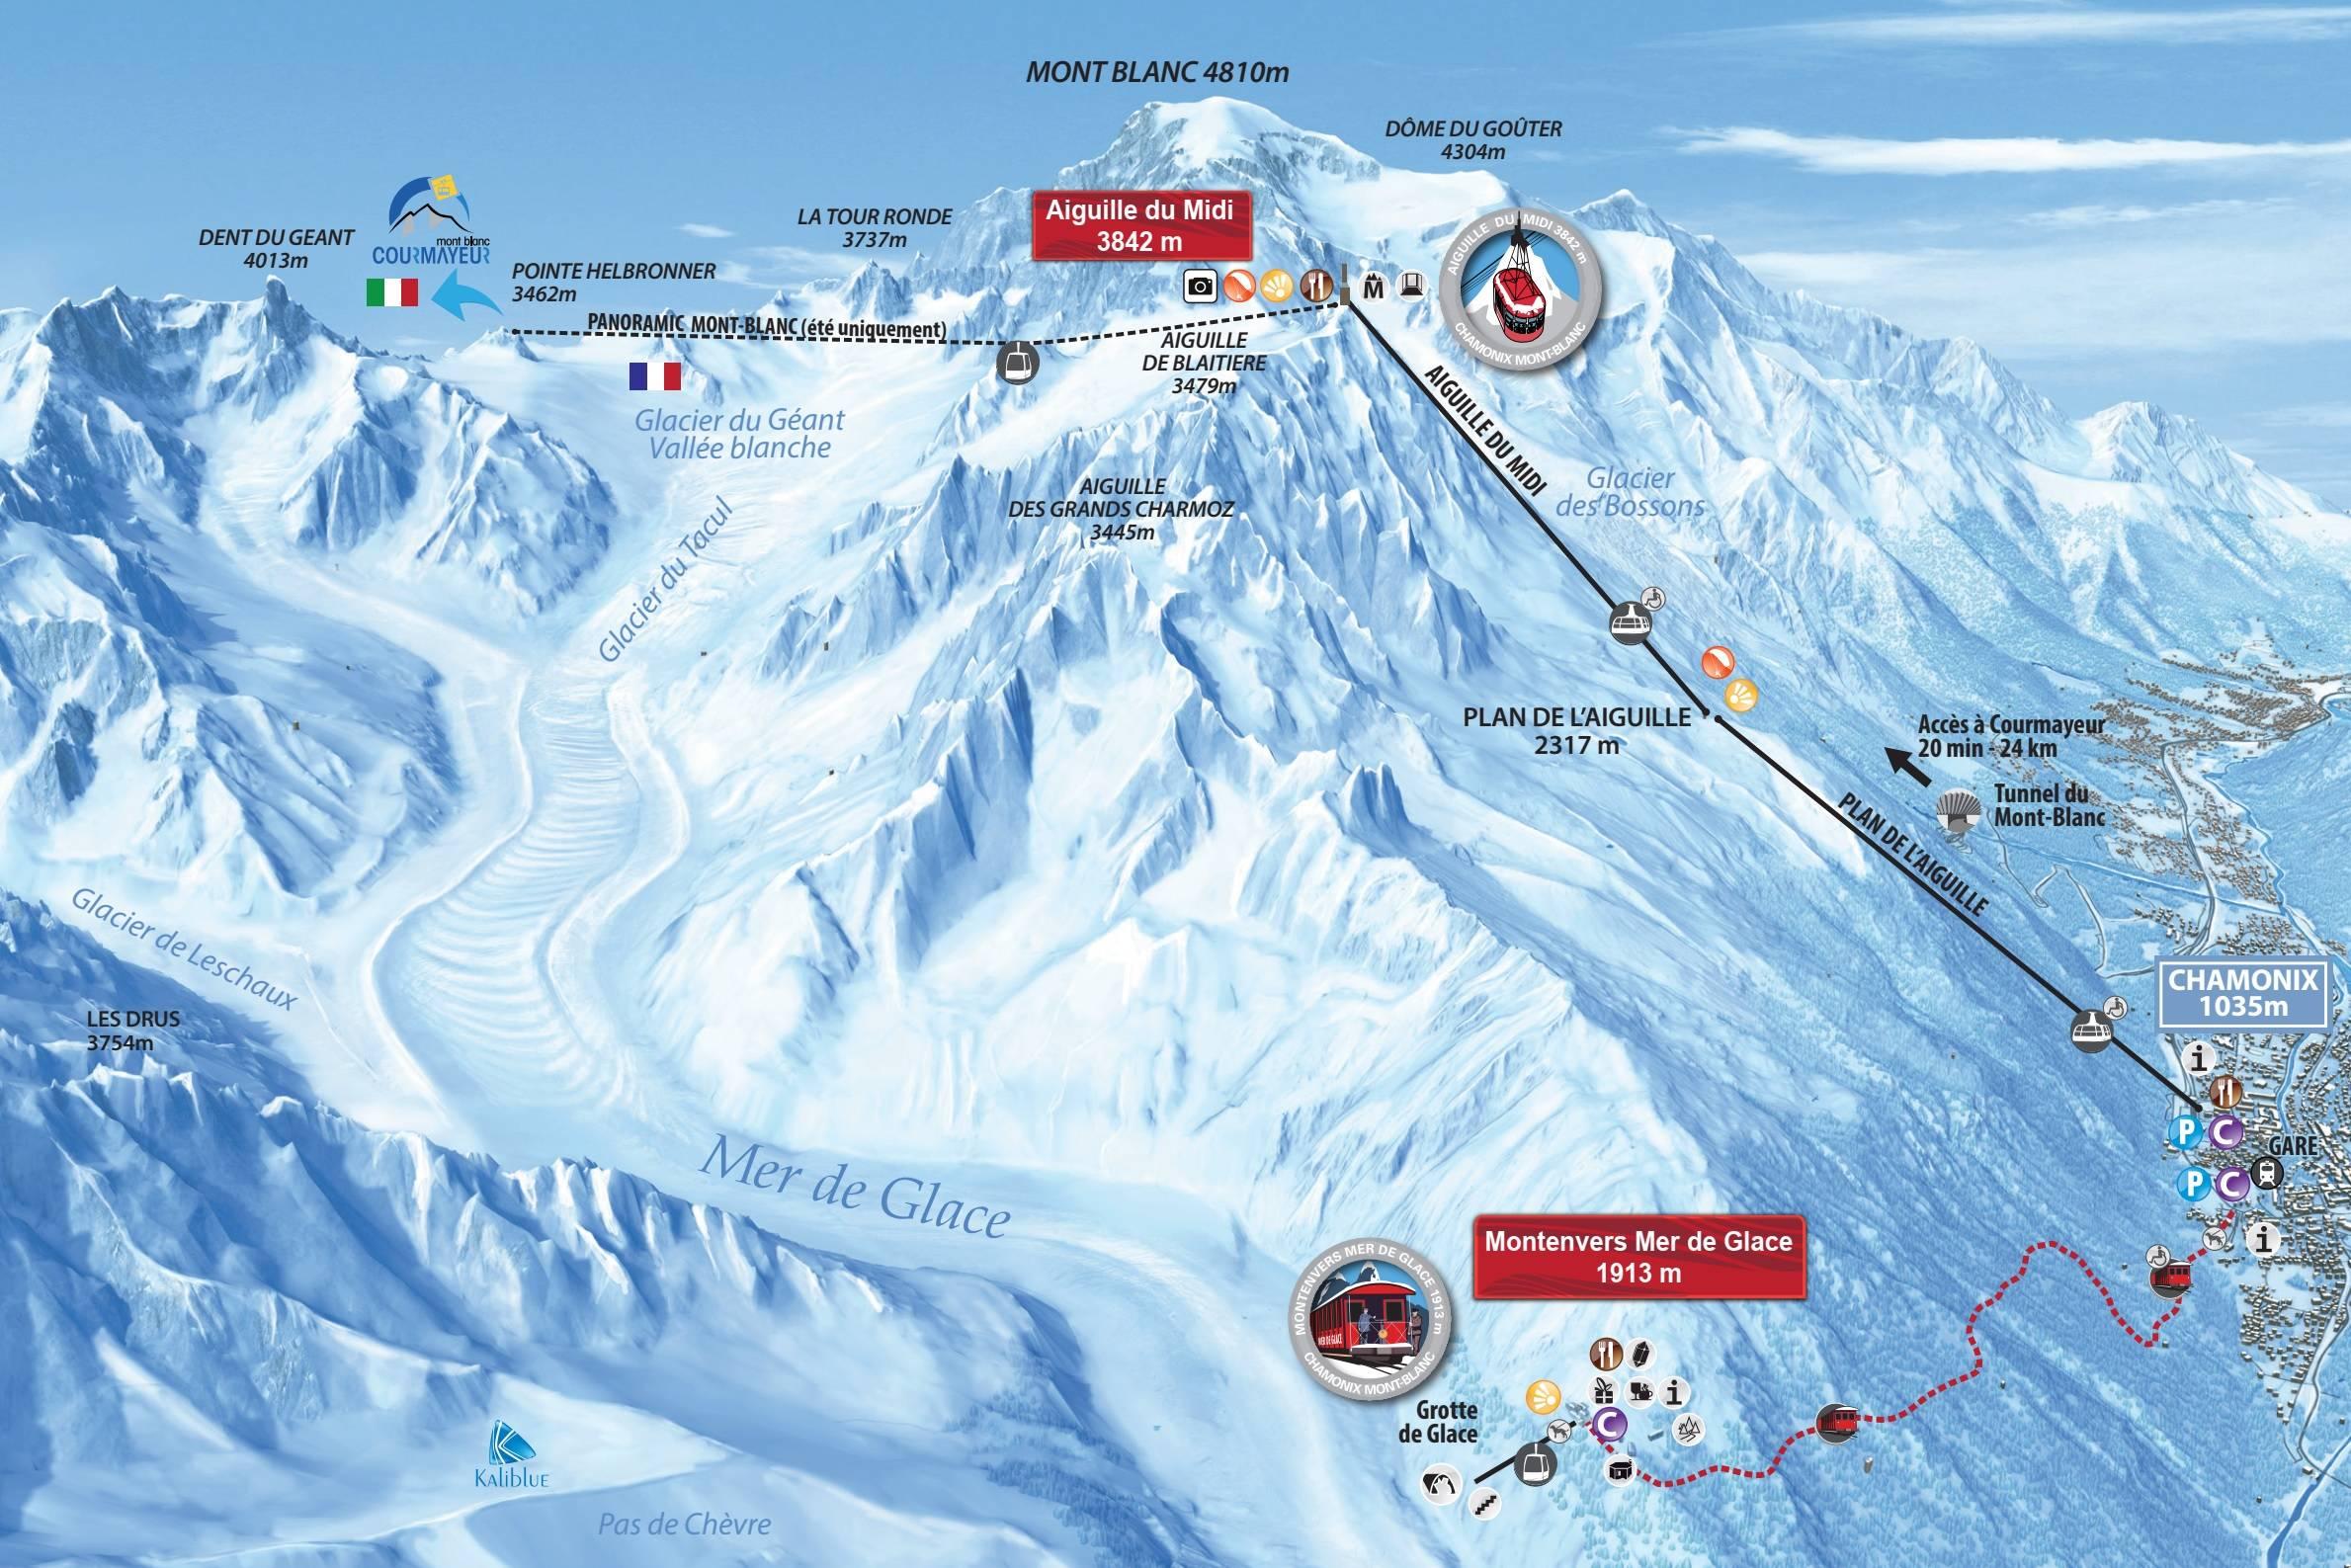 Trail Map Aiguille Du Midi Chamonix